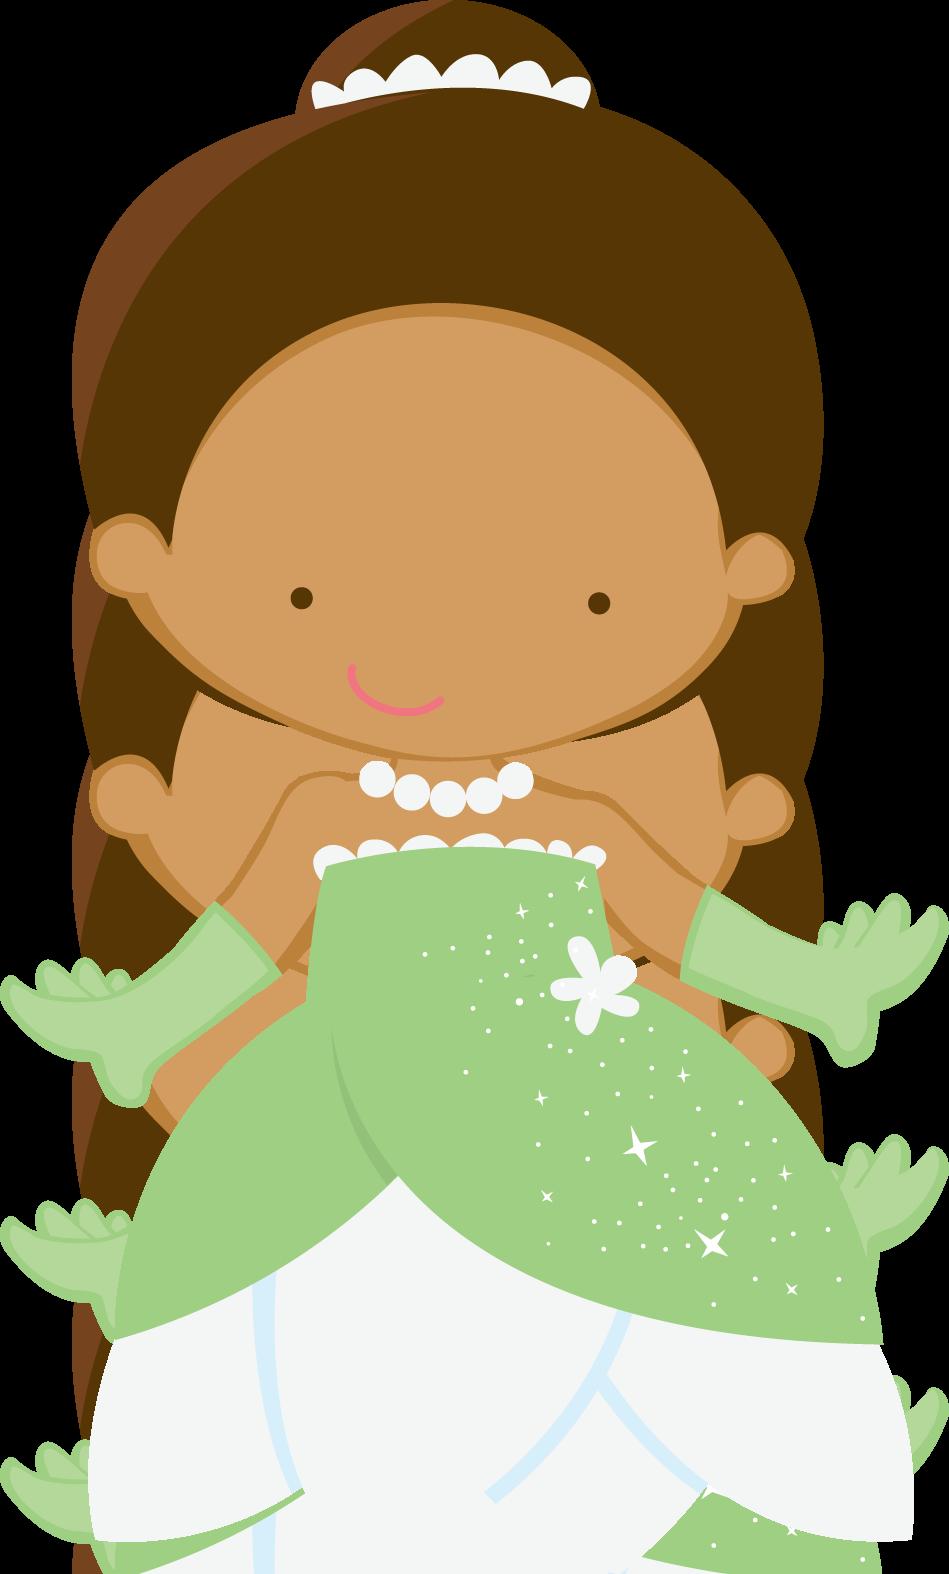 Chibi thanksgiving clipart banner transparent stock Princess Disney cutes II - ZWD_Princess_05.png - Minus | clipart ... banner transparent stock